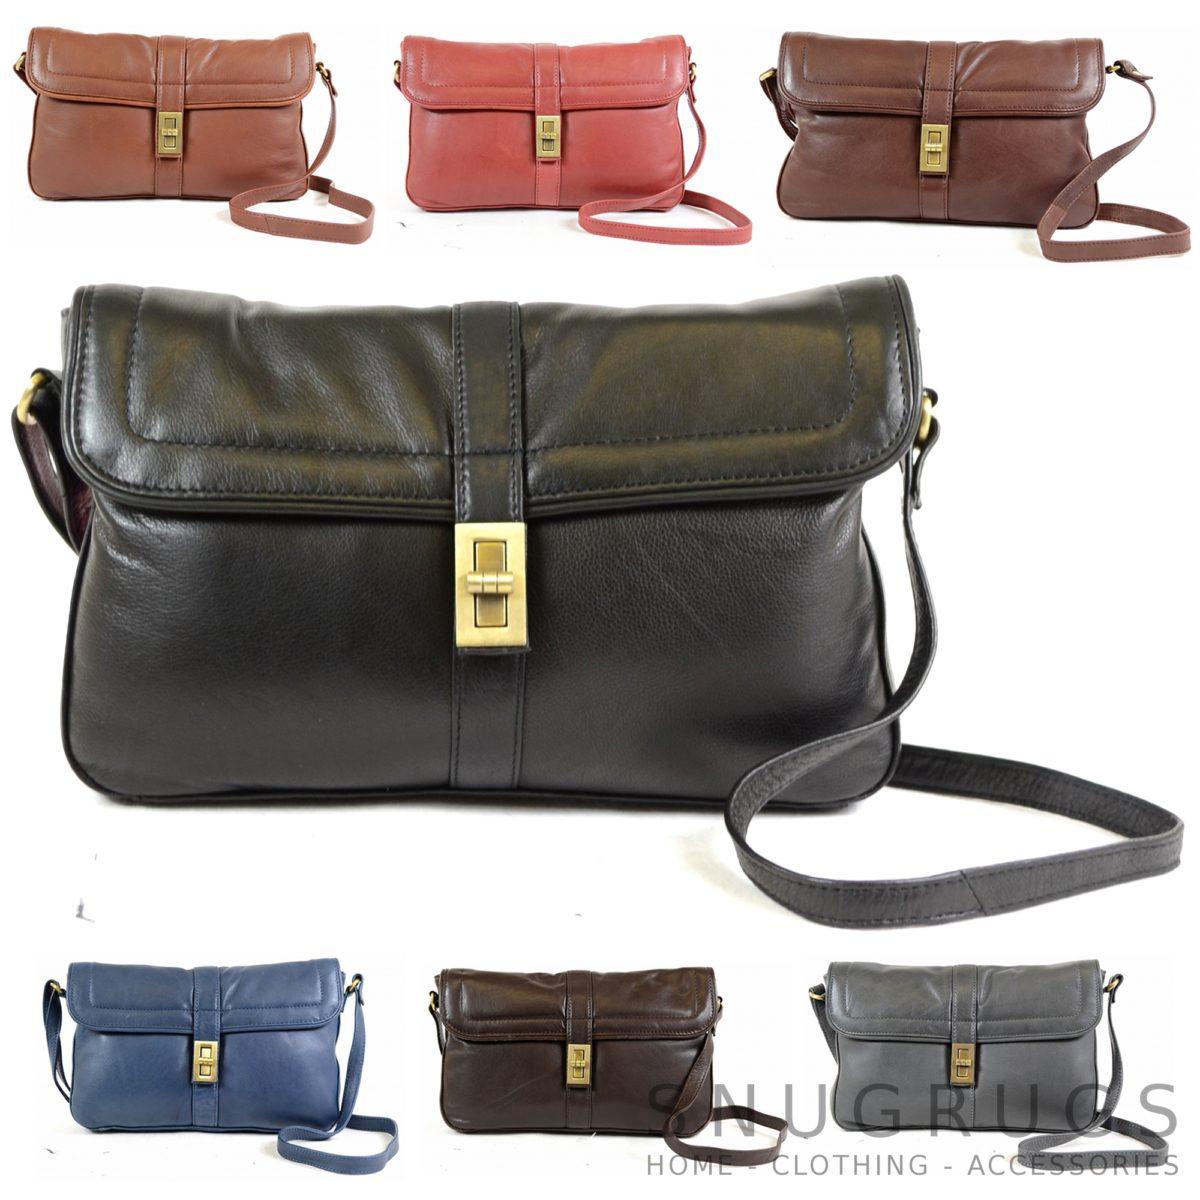 Maisy – Soft Premium Leather Shoulder Bag